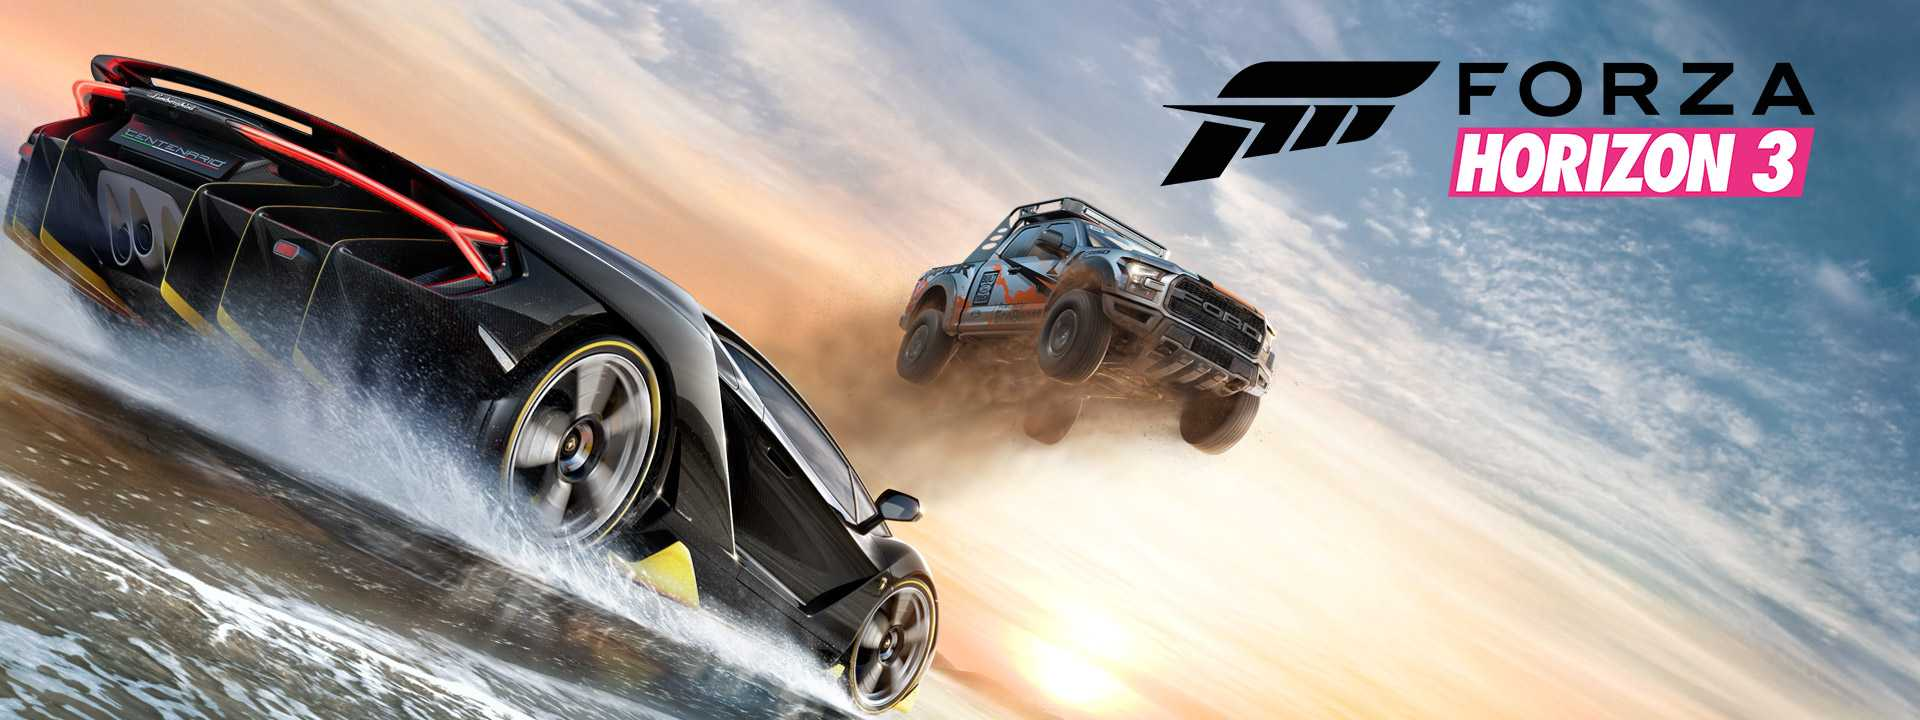 Купить Forza Horizon 3 (XBox One) со скидкой 50%